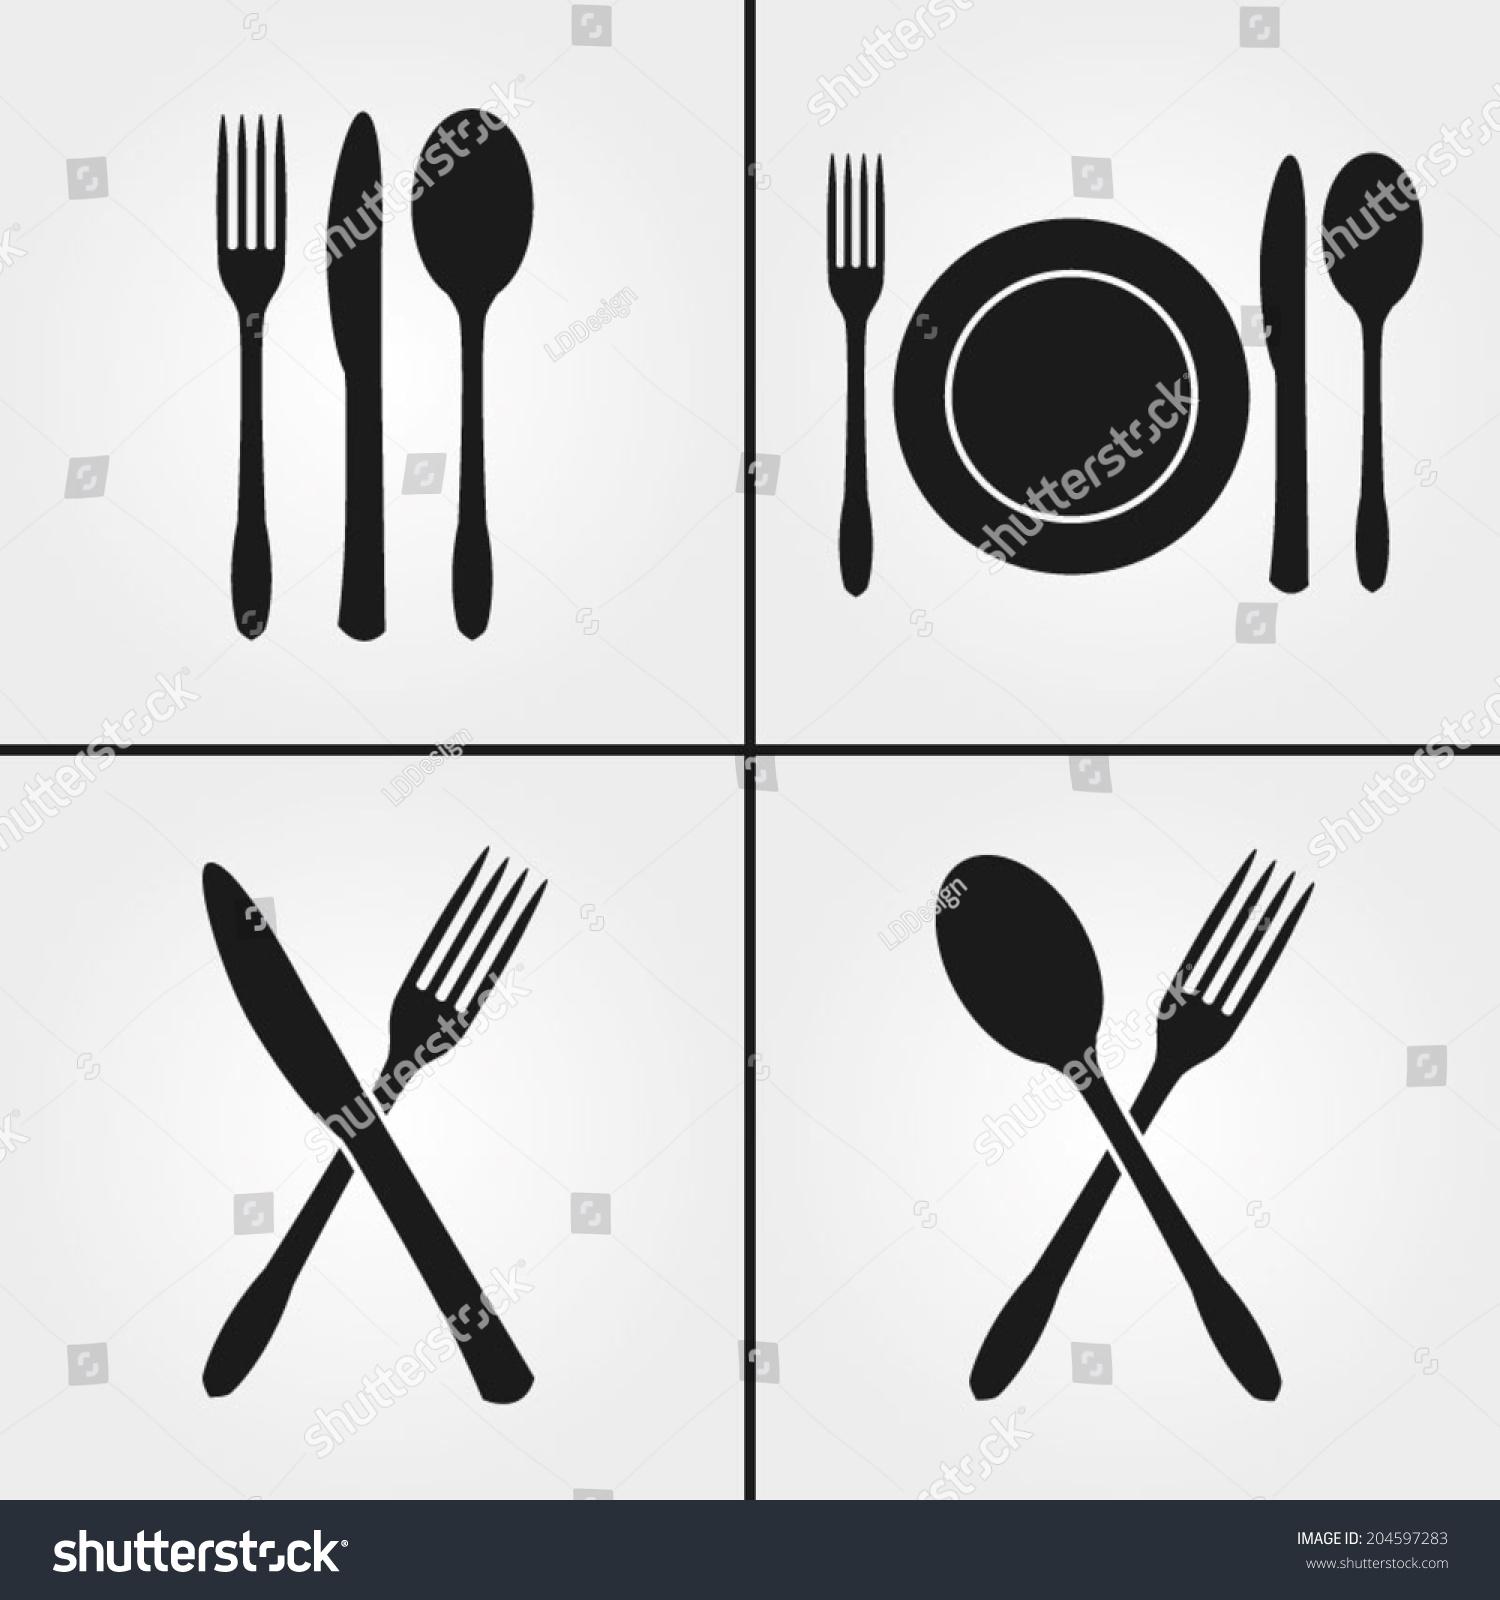 Cutlery restaurant icons stock vector shutterstock